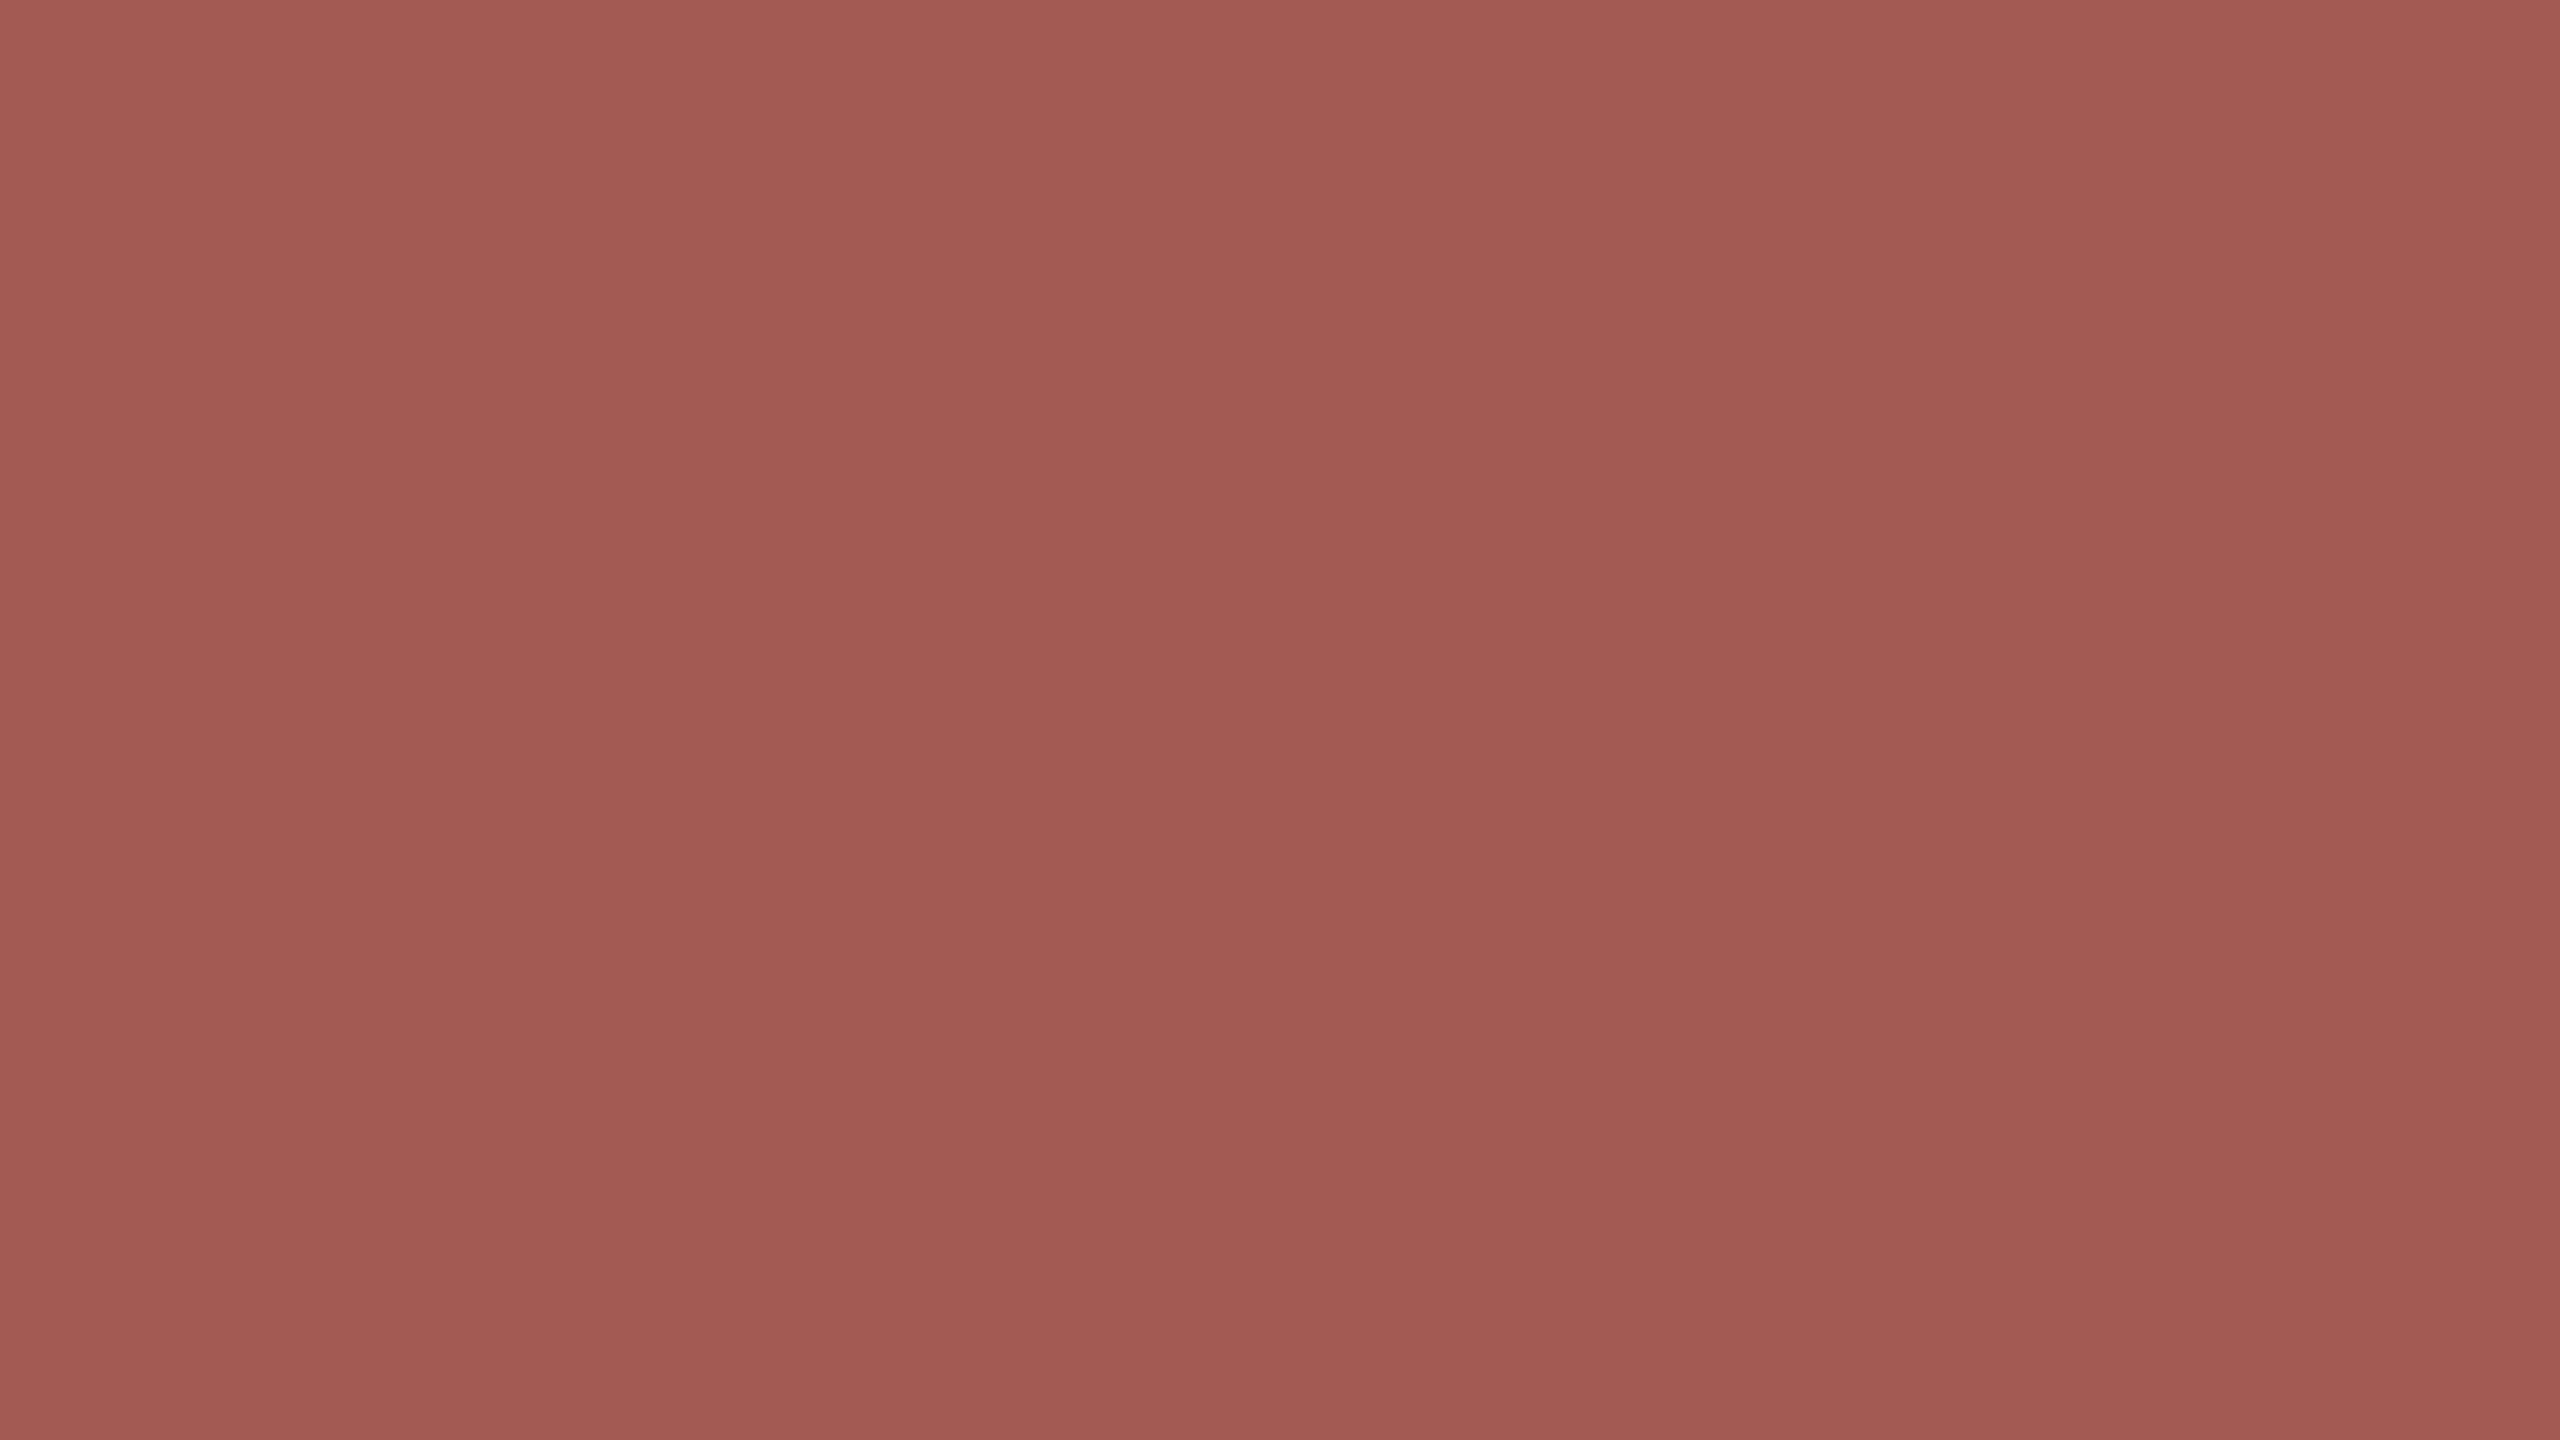 2560x1440 Redwood Solid Color Background